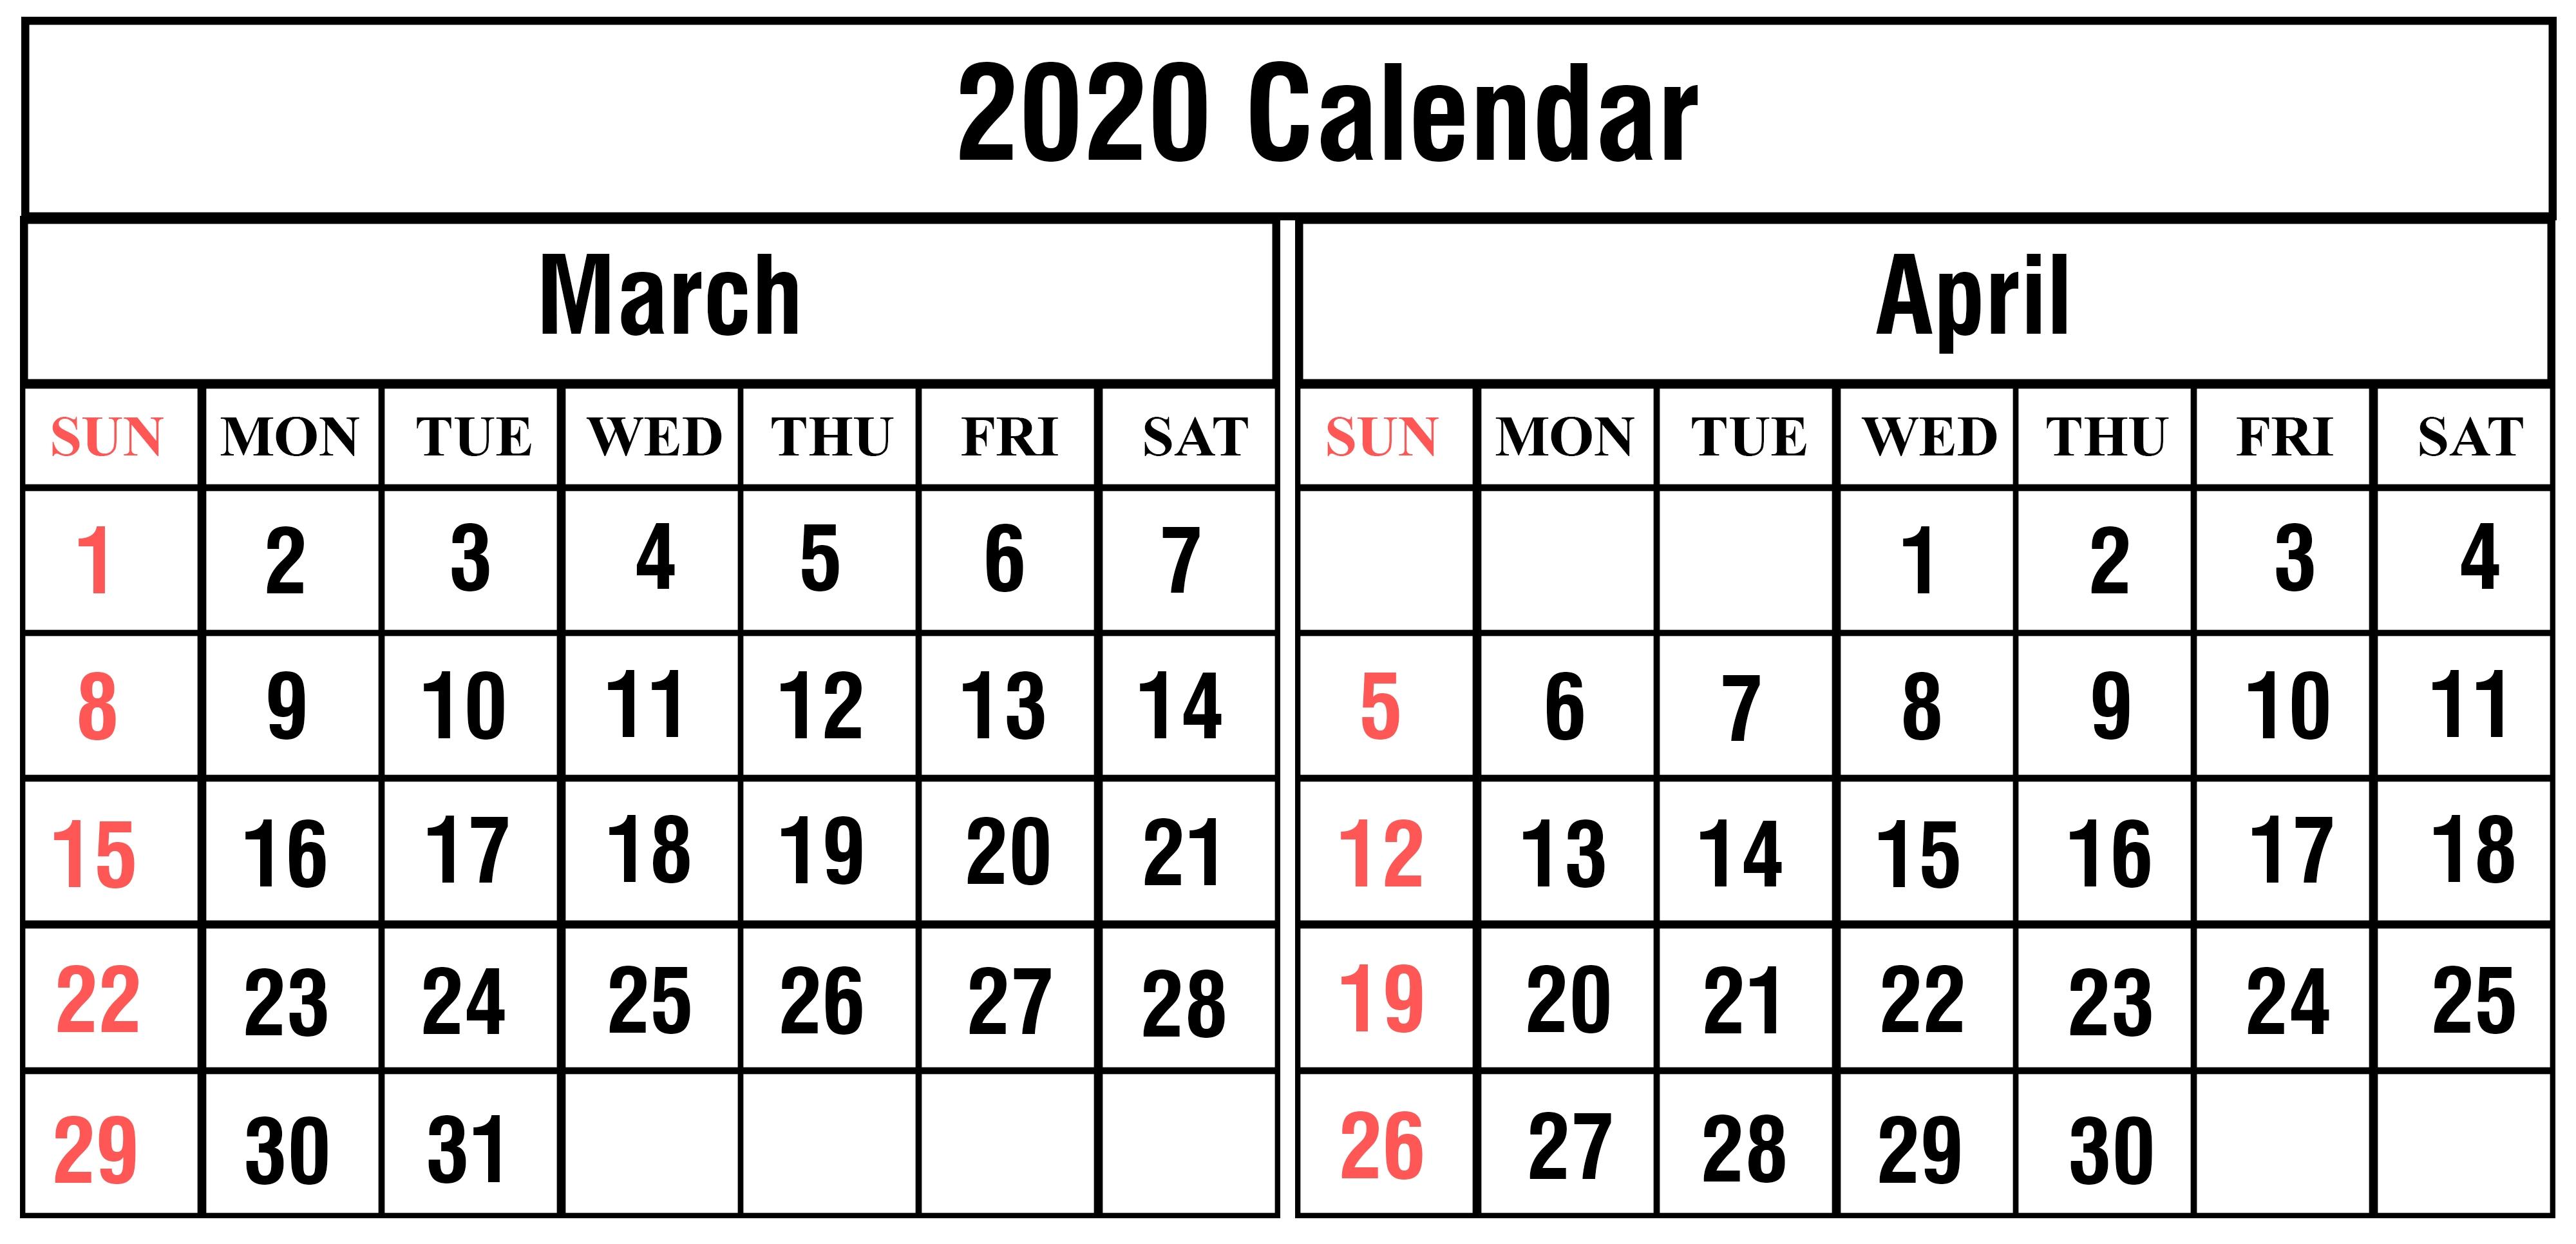 March And April 2020 Calendar | Calendar Template Information